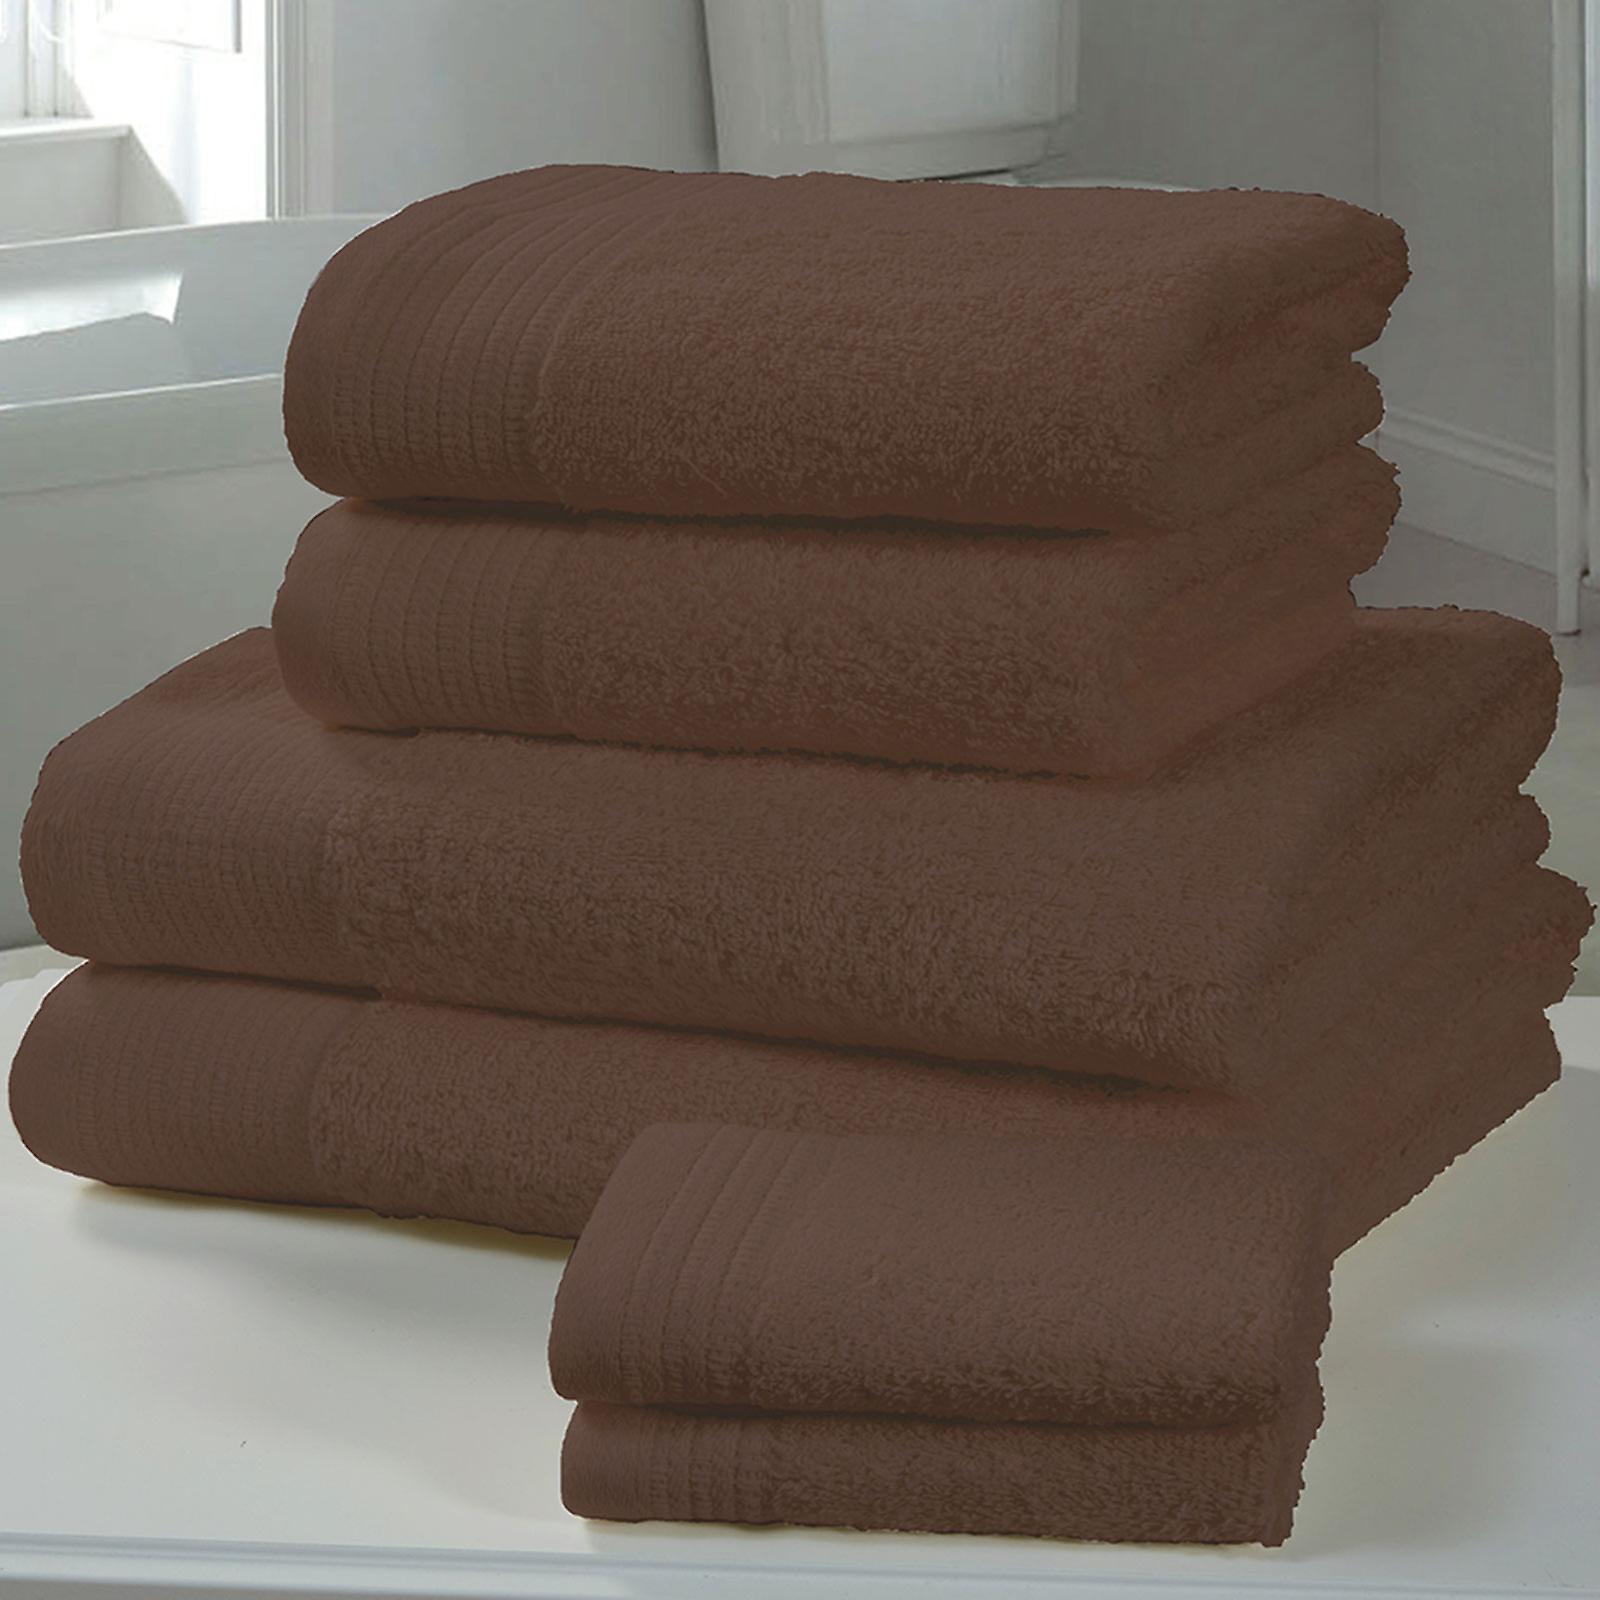 Chatsworth 4 Piece Towel Bale Chocolate- 2 Hand Towels, 2 Bath Towels